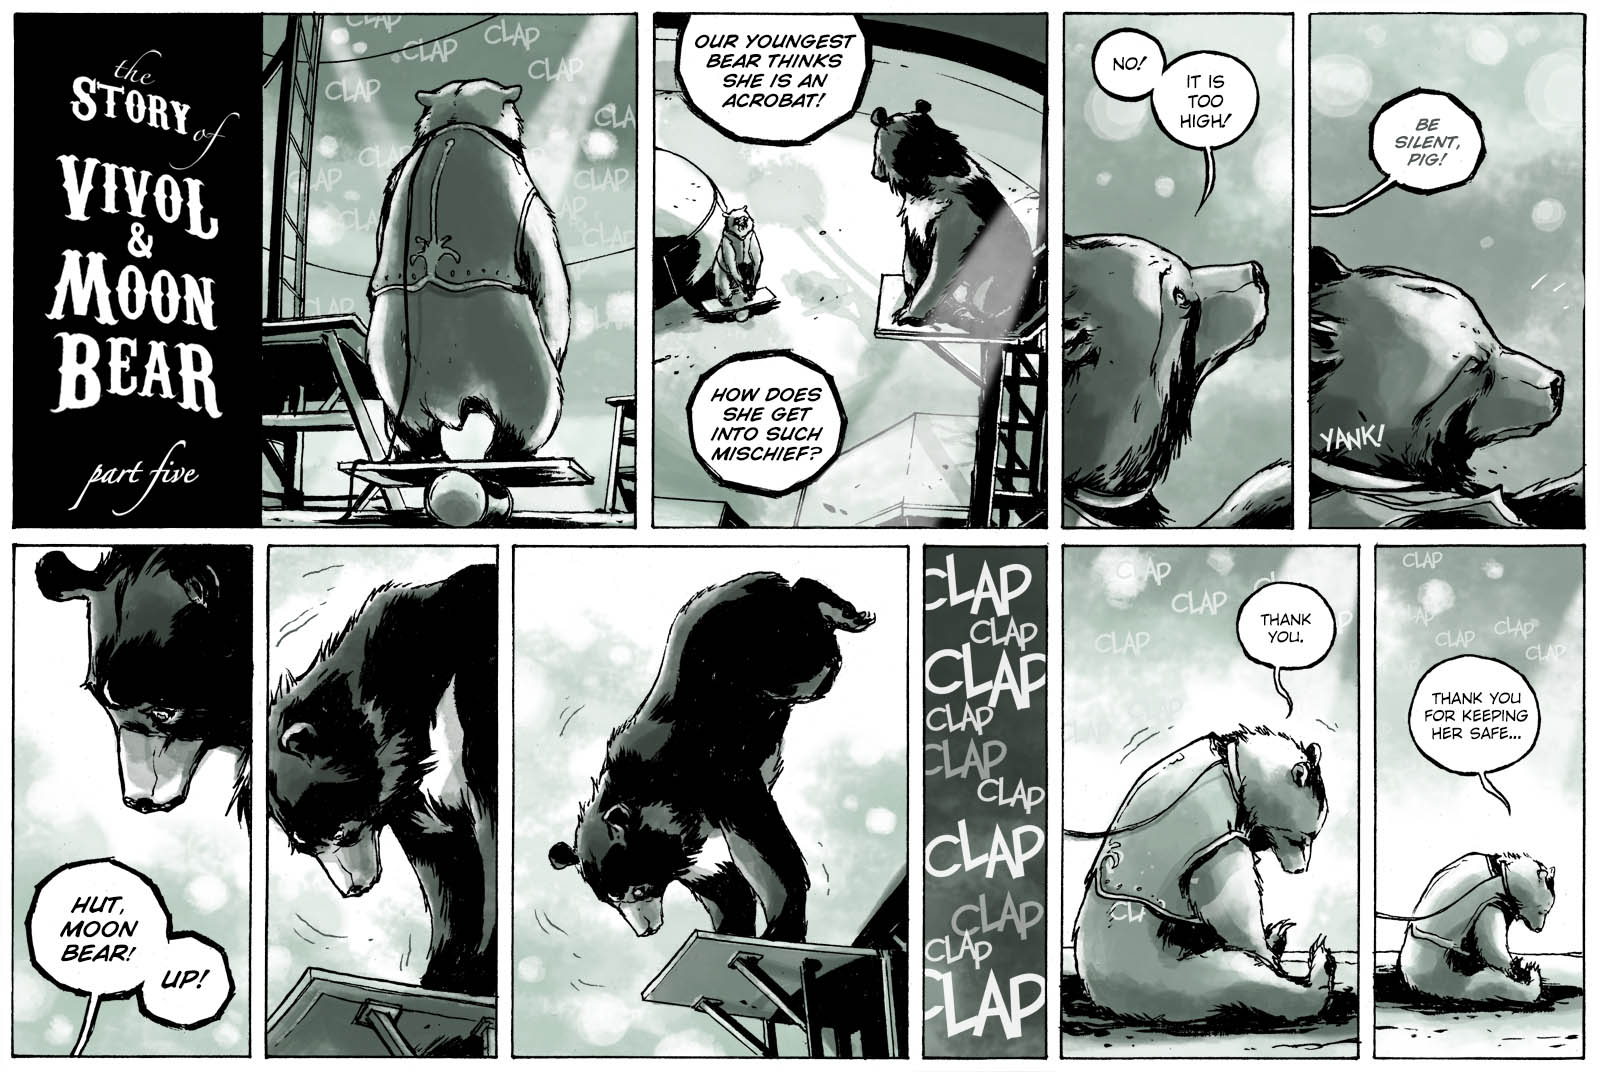 The Story of Vivol & Moon Bear – part five